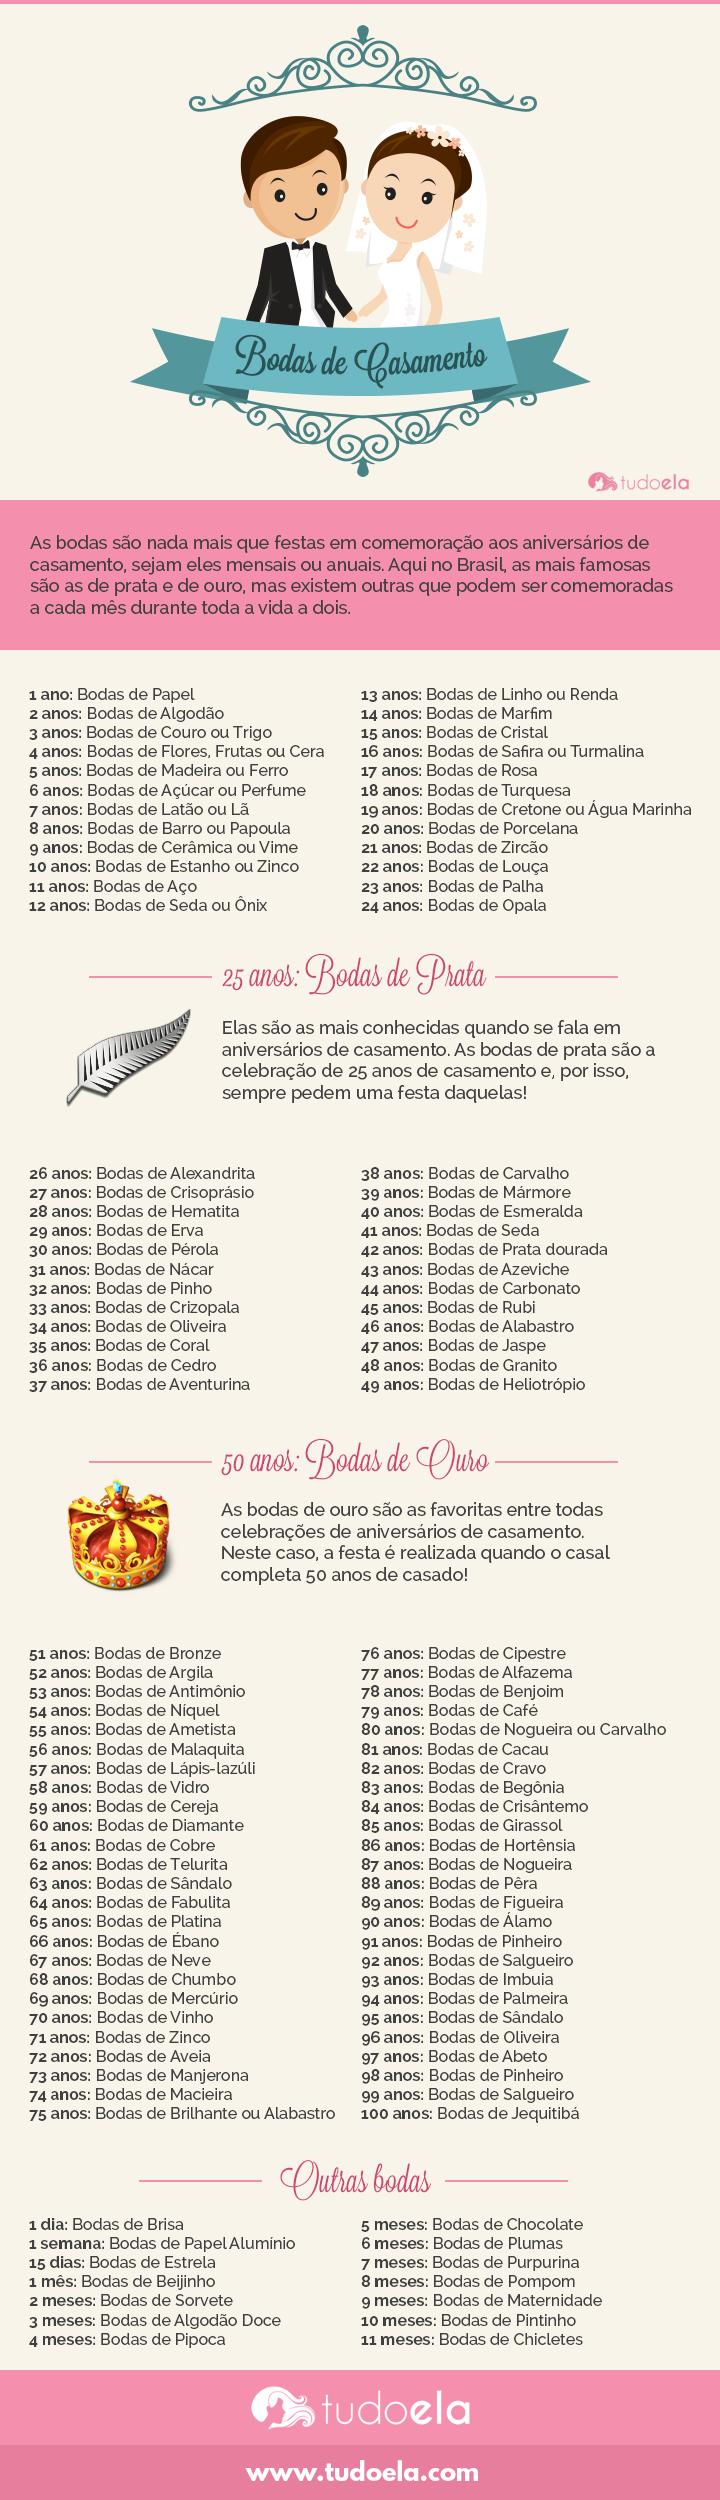 20 Anos De Casados Bodas De Cretone Unpasticheorg